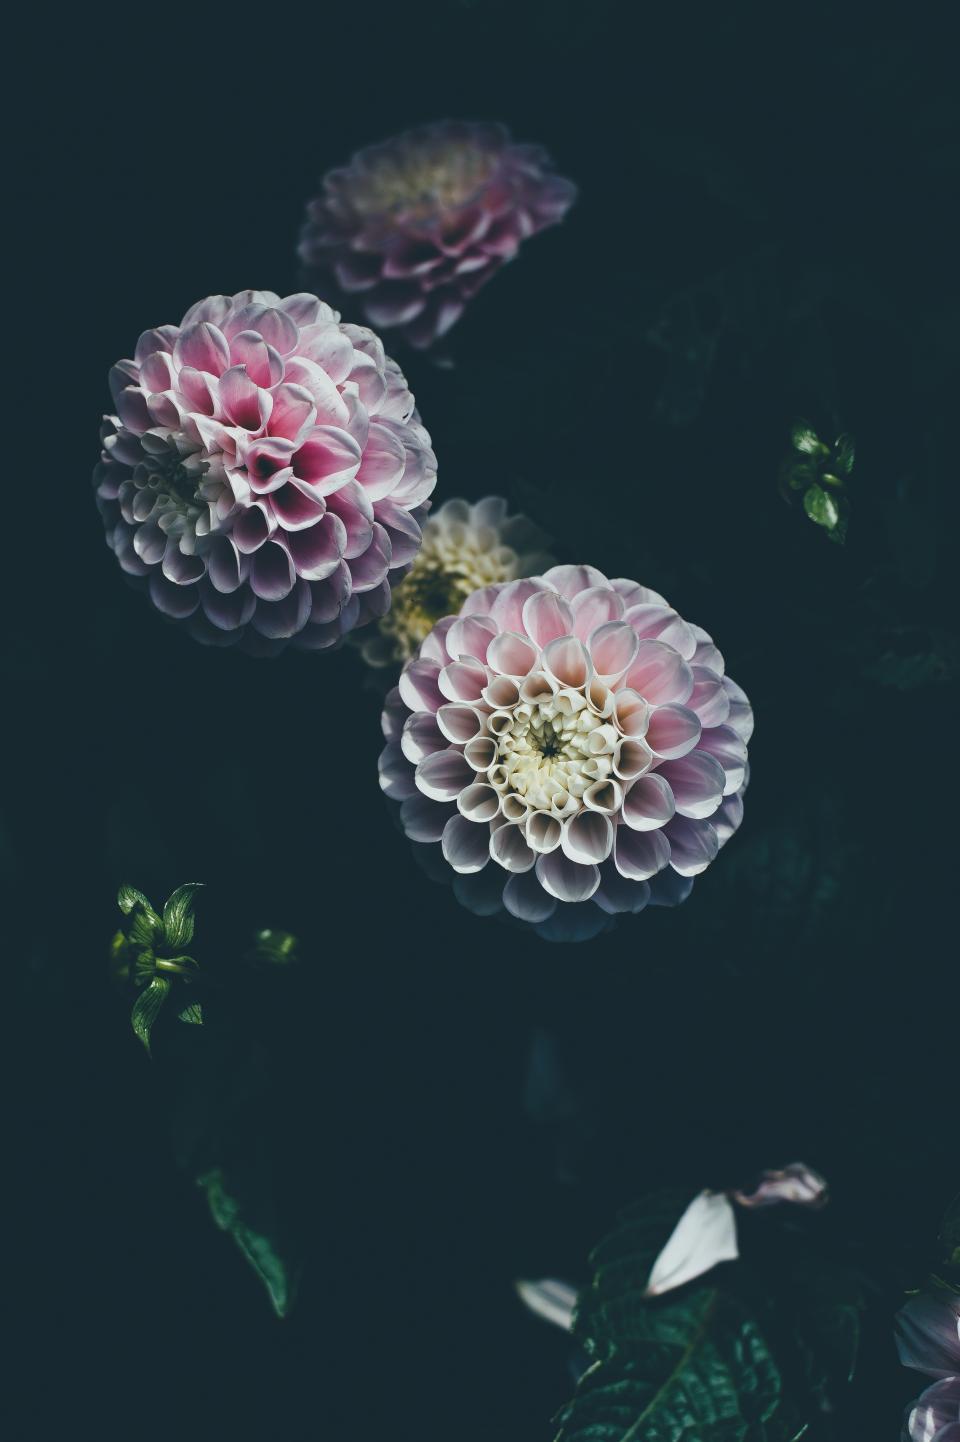 dark, dahlia, flower, petals, plant, nature